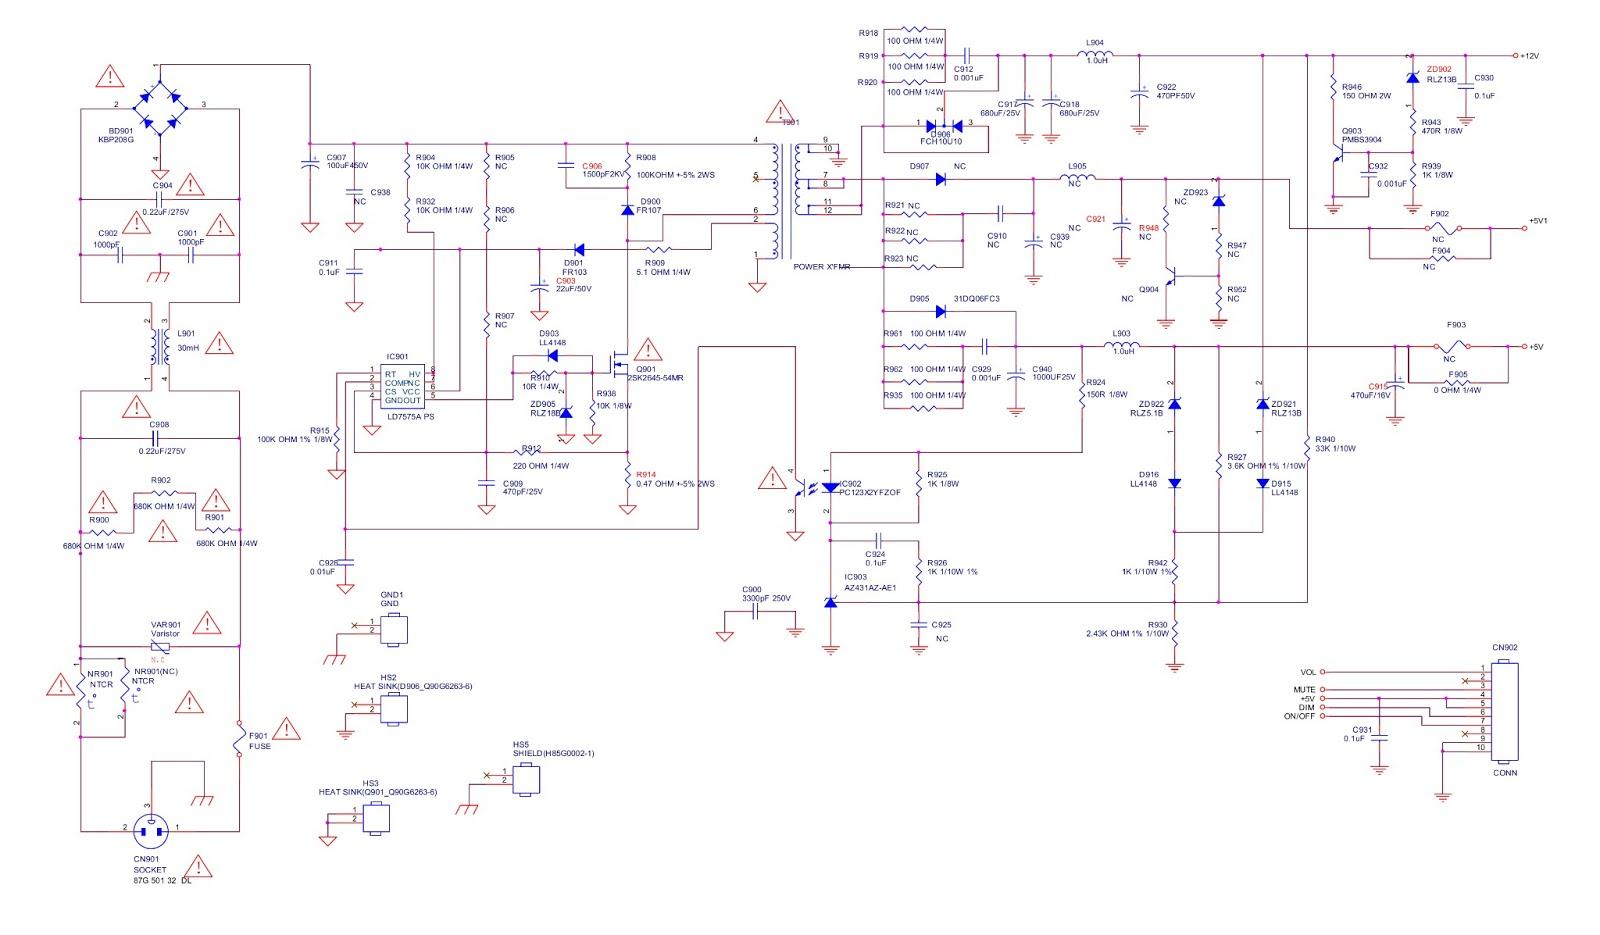 BenQ LCD G922HD  MAIN POWER SUPPLY  SCHEMATIC DIAGRAM | Electro help